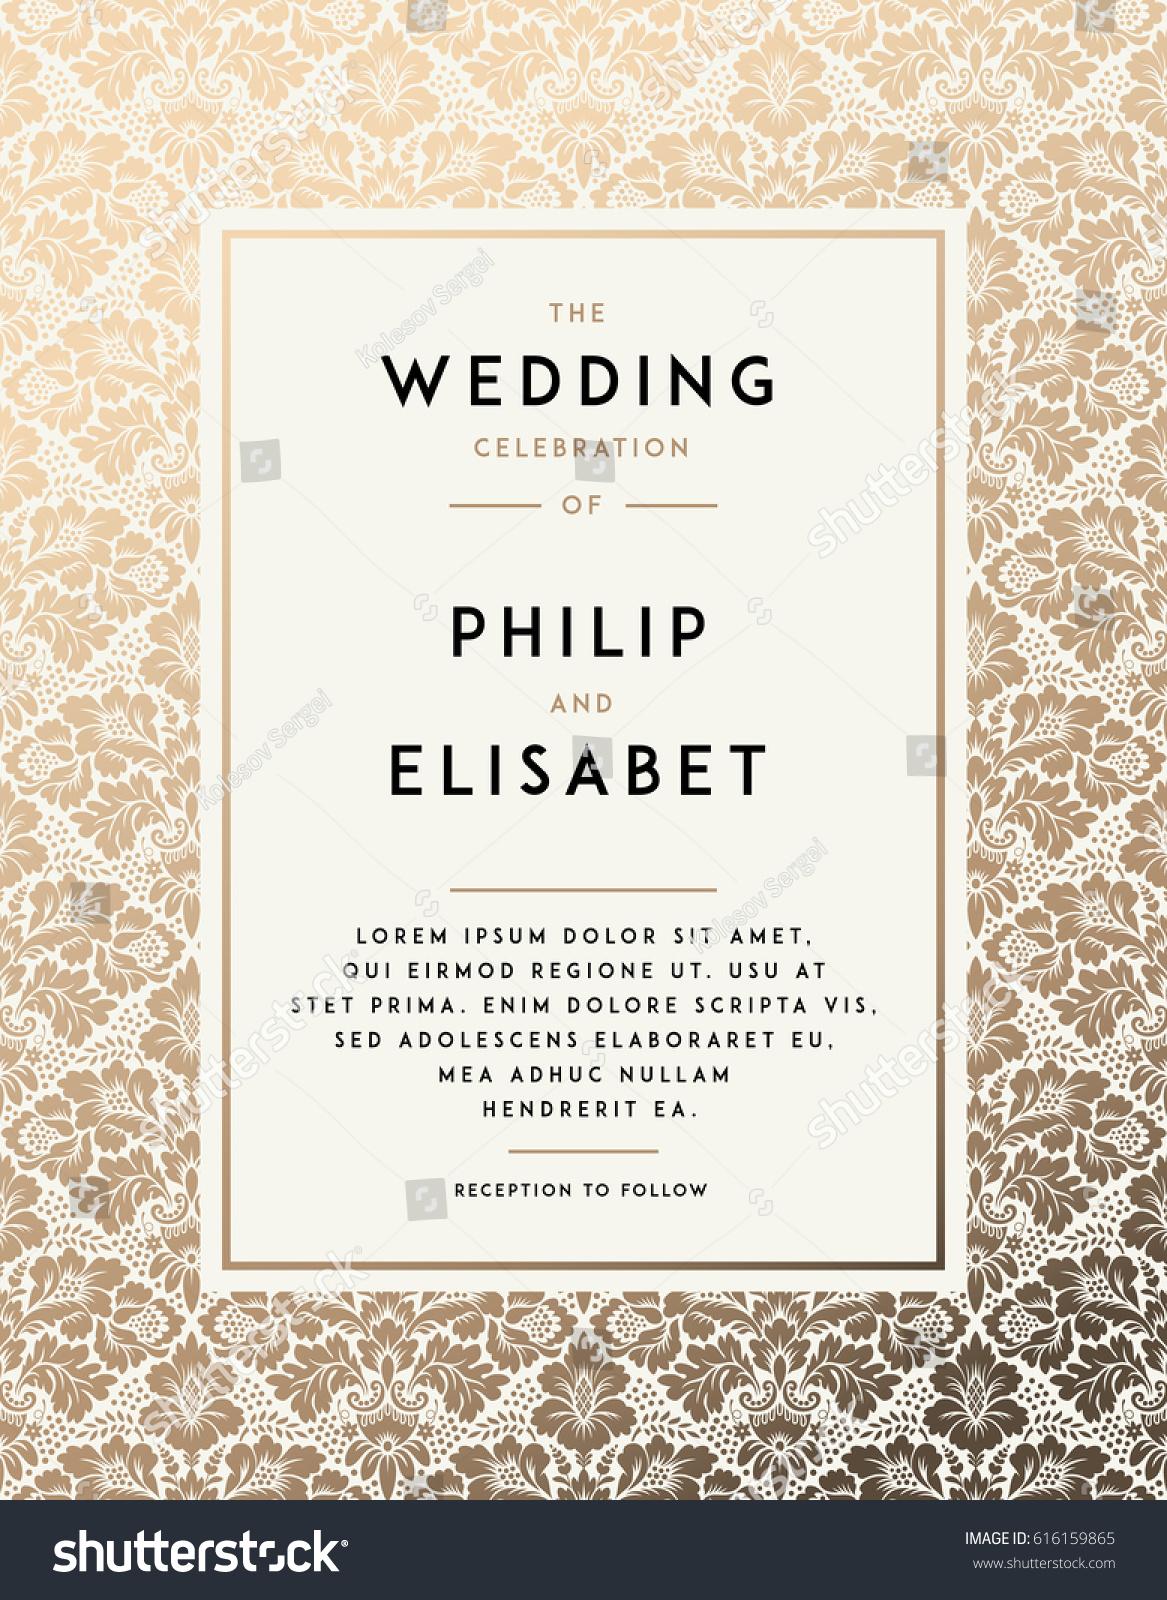 Vintage Wedding Invitation Design Template Damask Stock Vector HD ...